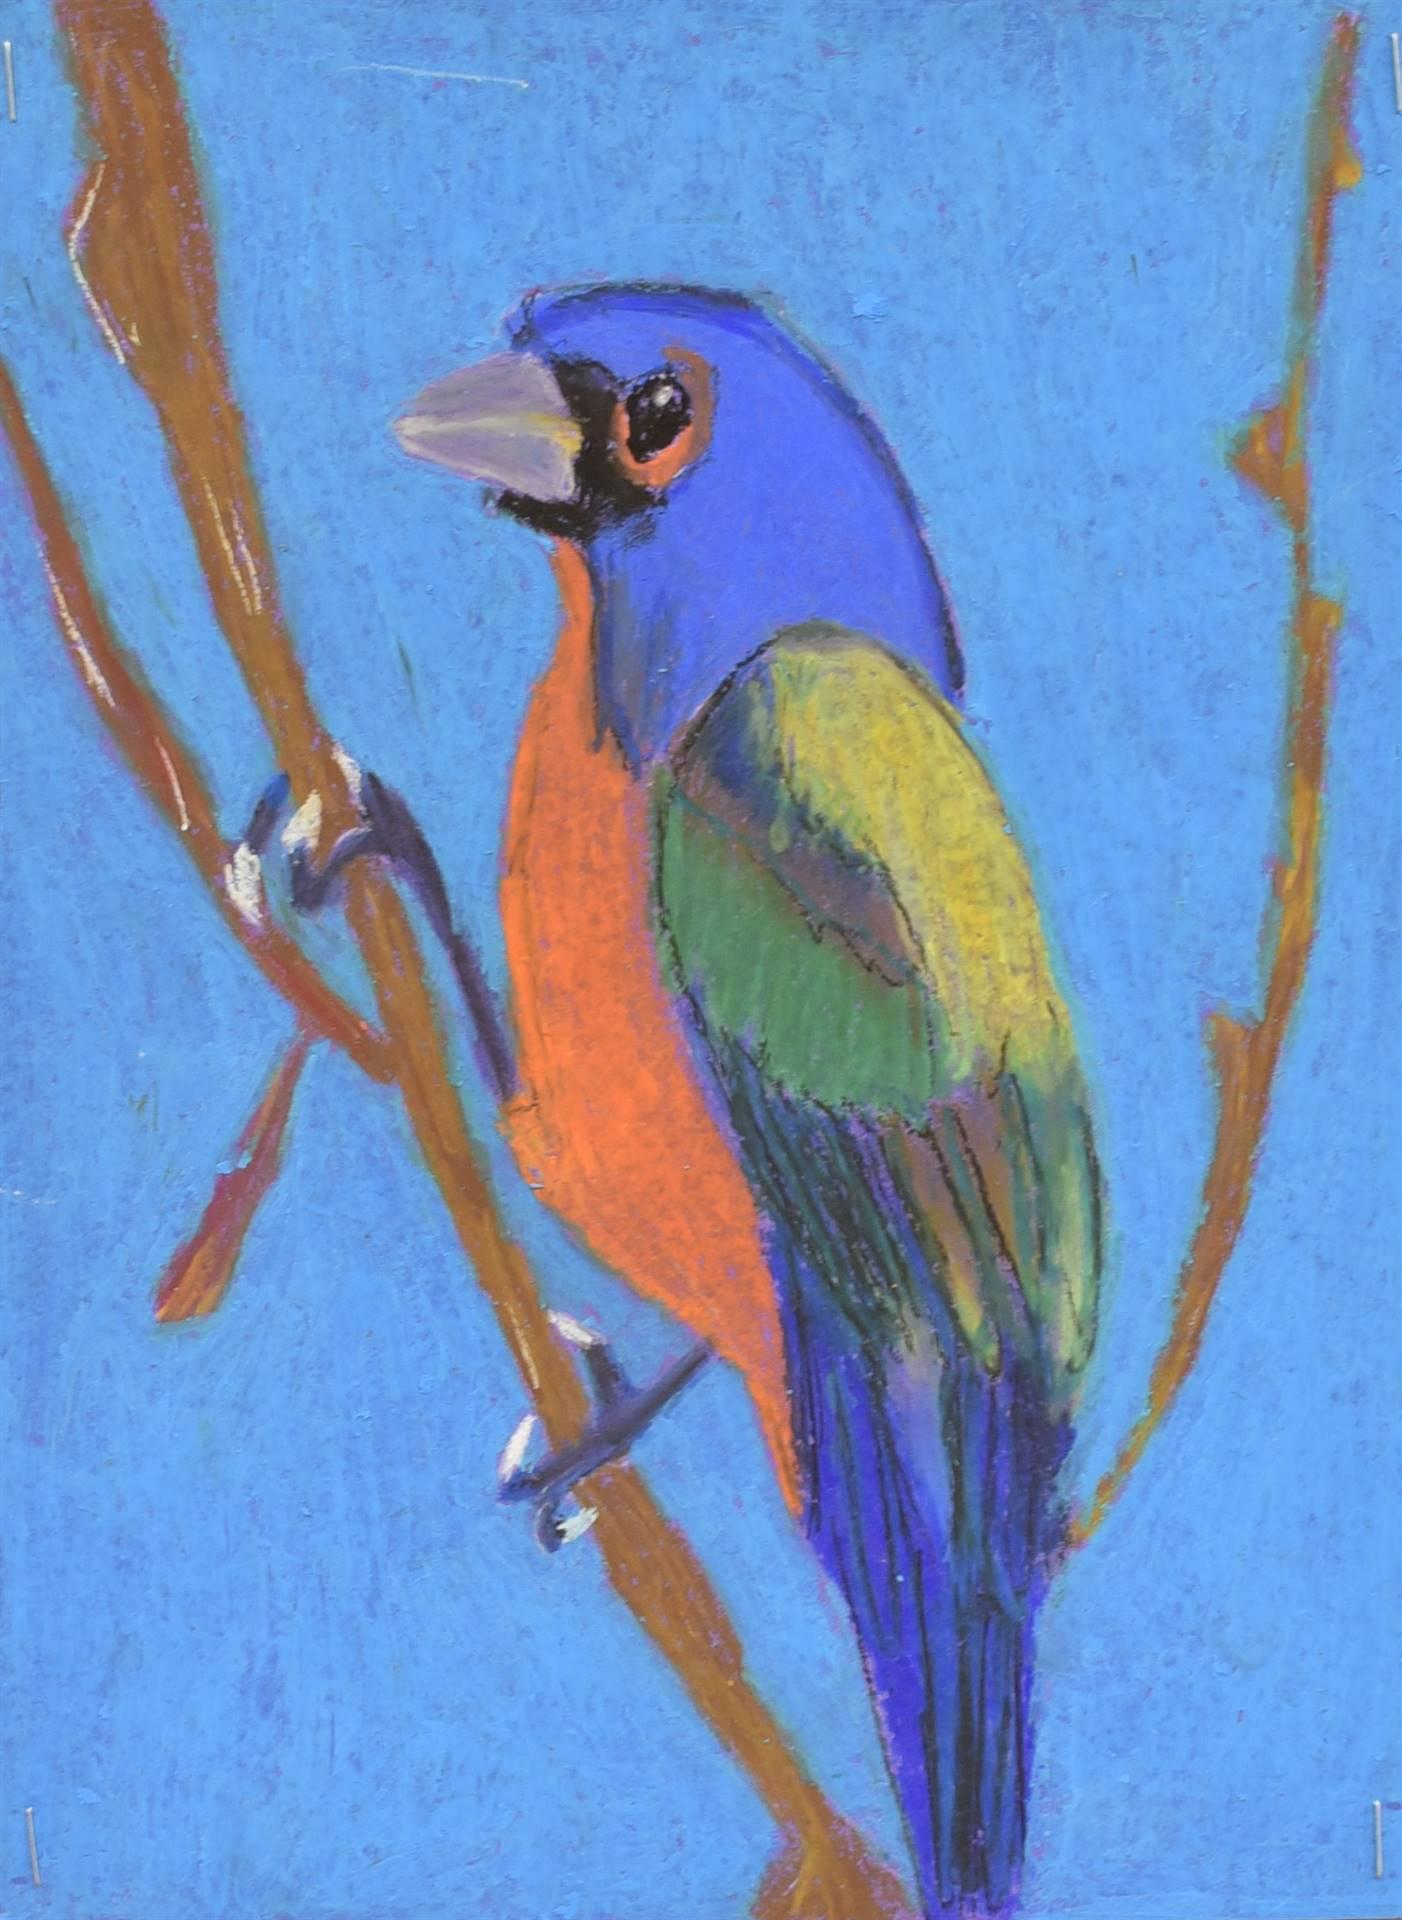 Brecksville-Broadview Hts. Middle School Art Projects 118